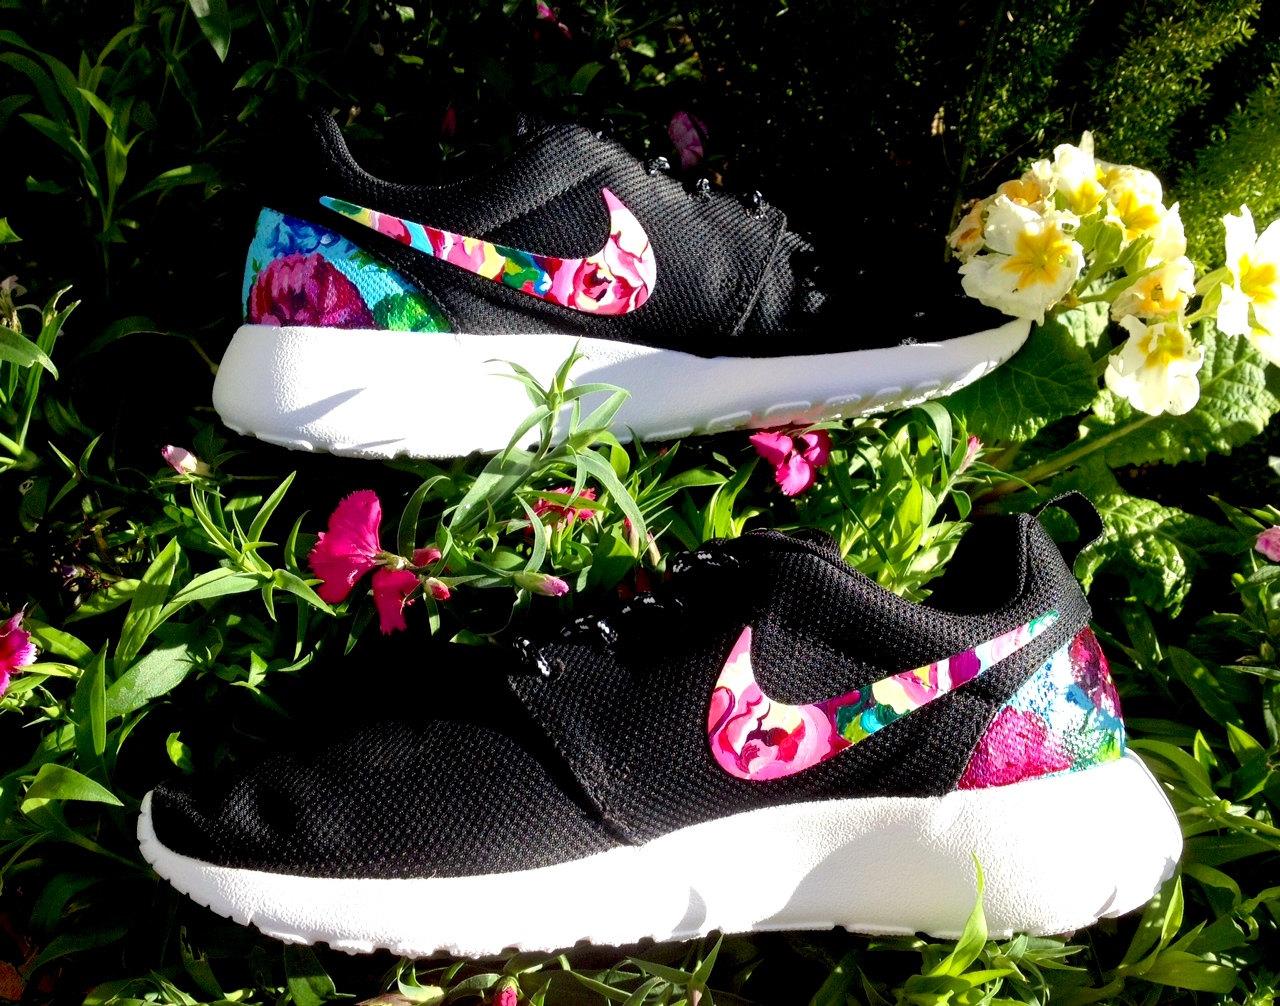 Nike Roshe Floral - Nike Roshe Run Femmes Trainers Chaussures Uk Leisure Vip Store Nike Sport Code Promo